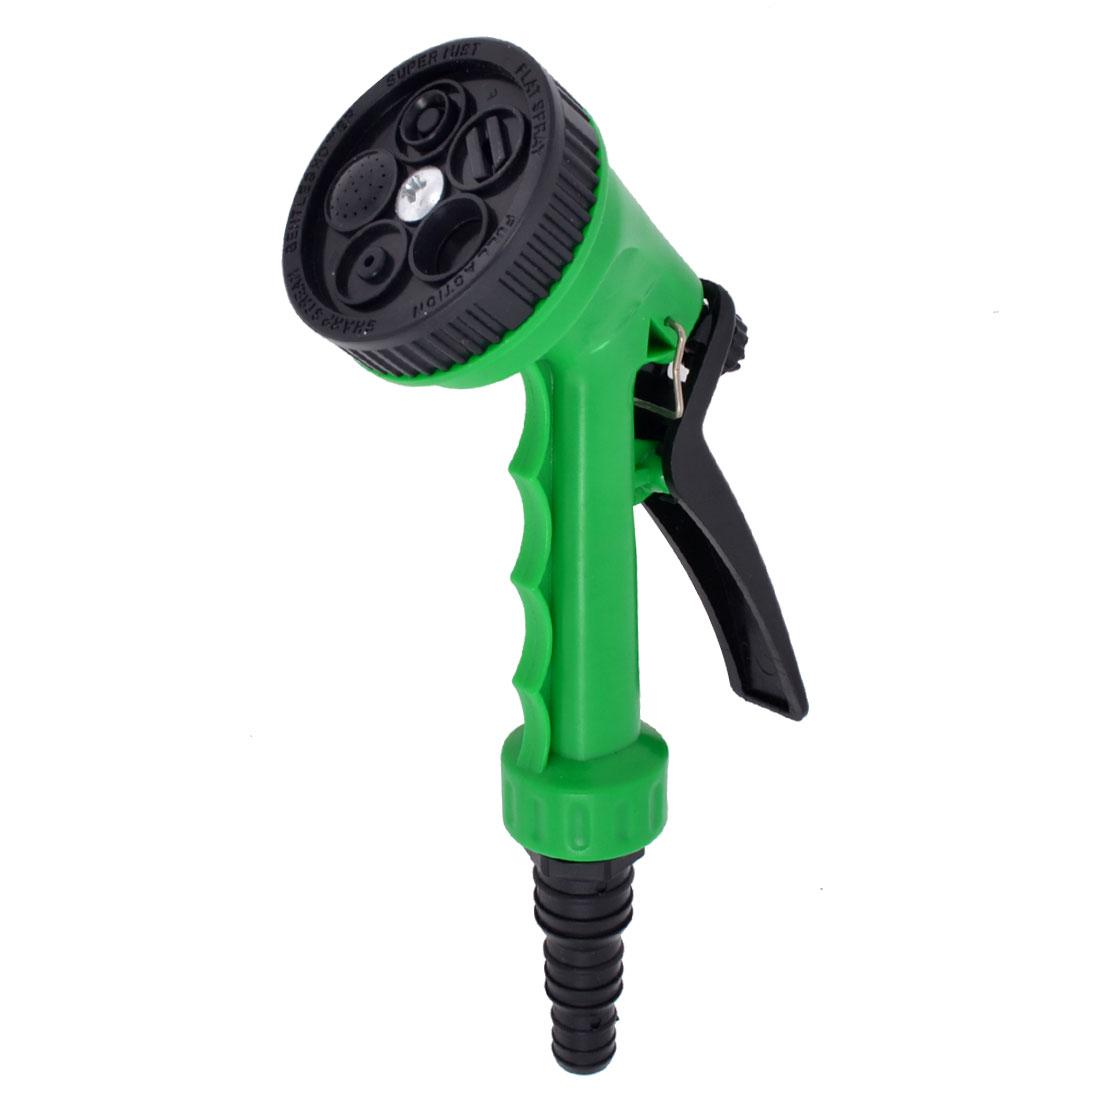 Garden Lawn Green Plastic Rear Trigger Hose Spray Nozzle